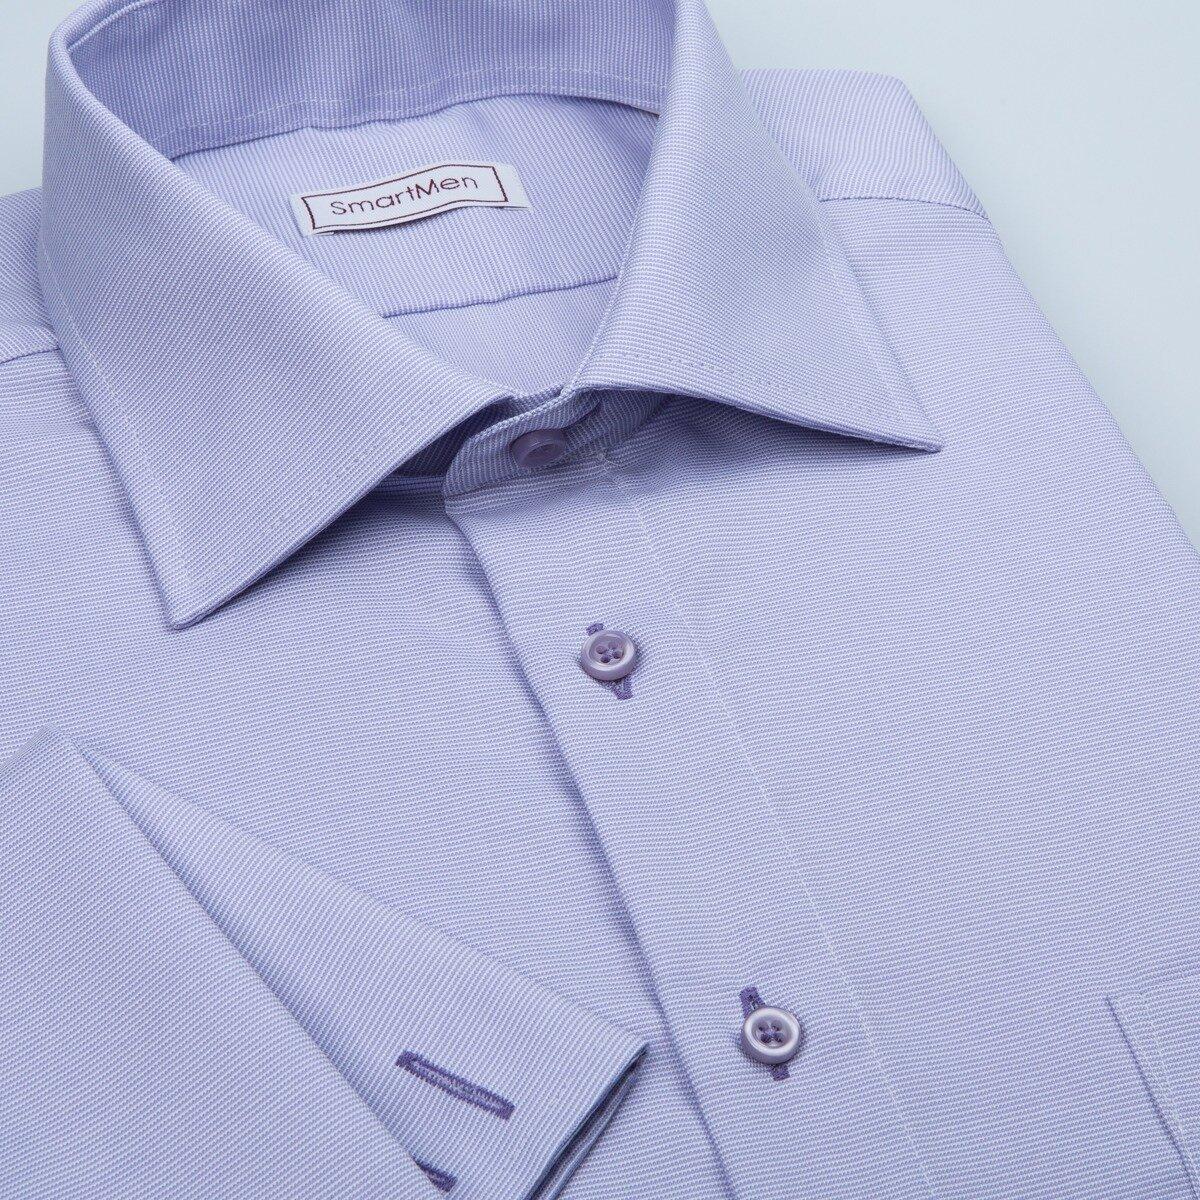 57d223411d34 Pánska luxusná košeľa fialová na manžetové gombíky